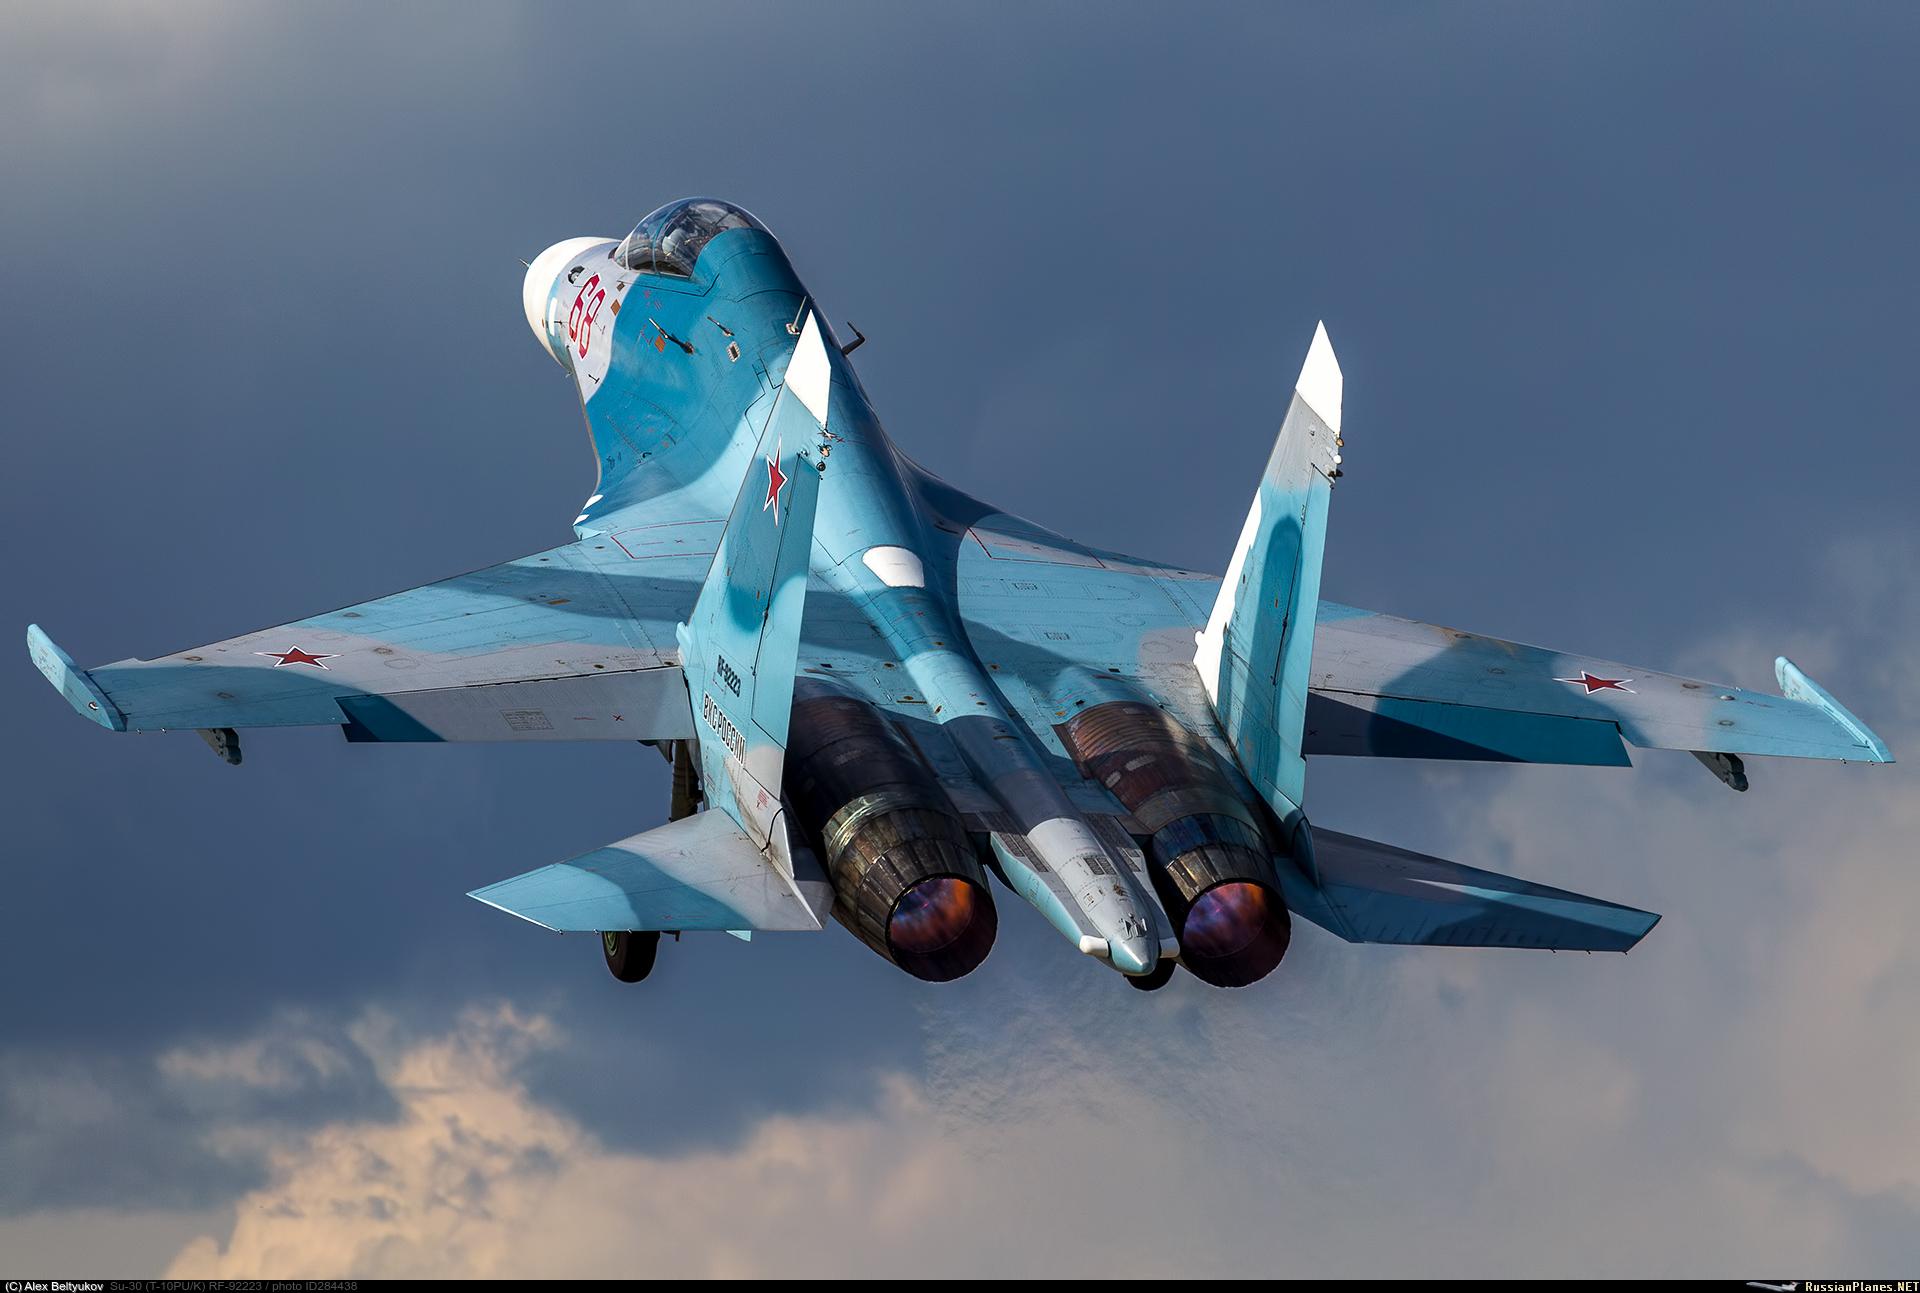 https://russianplanes.net/images/to285000/284438.jpg